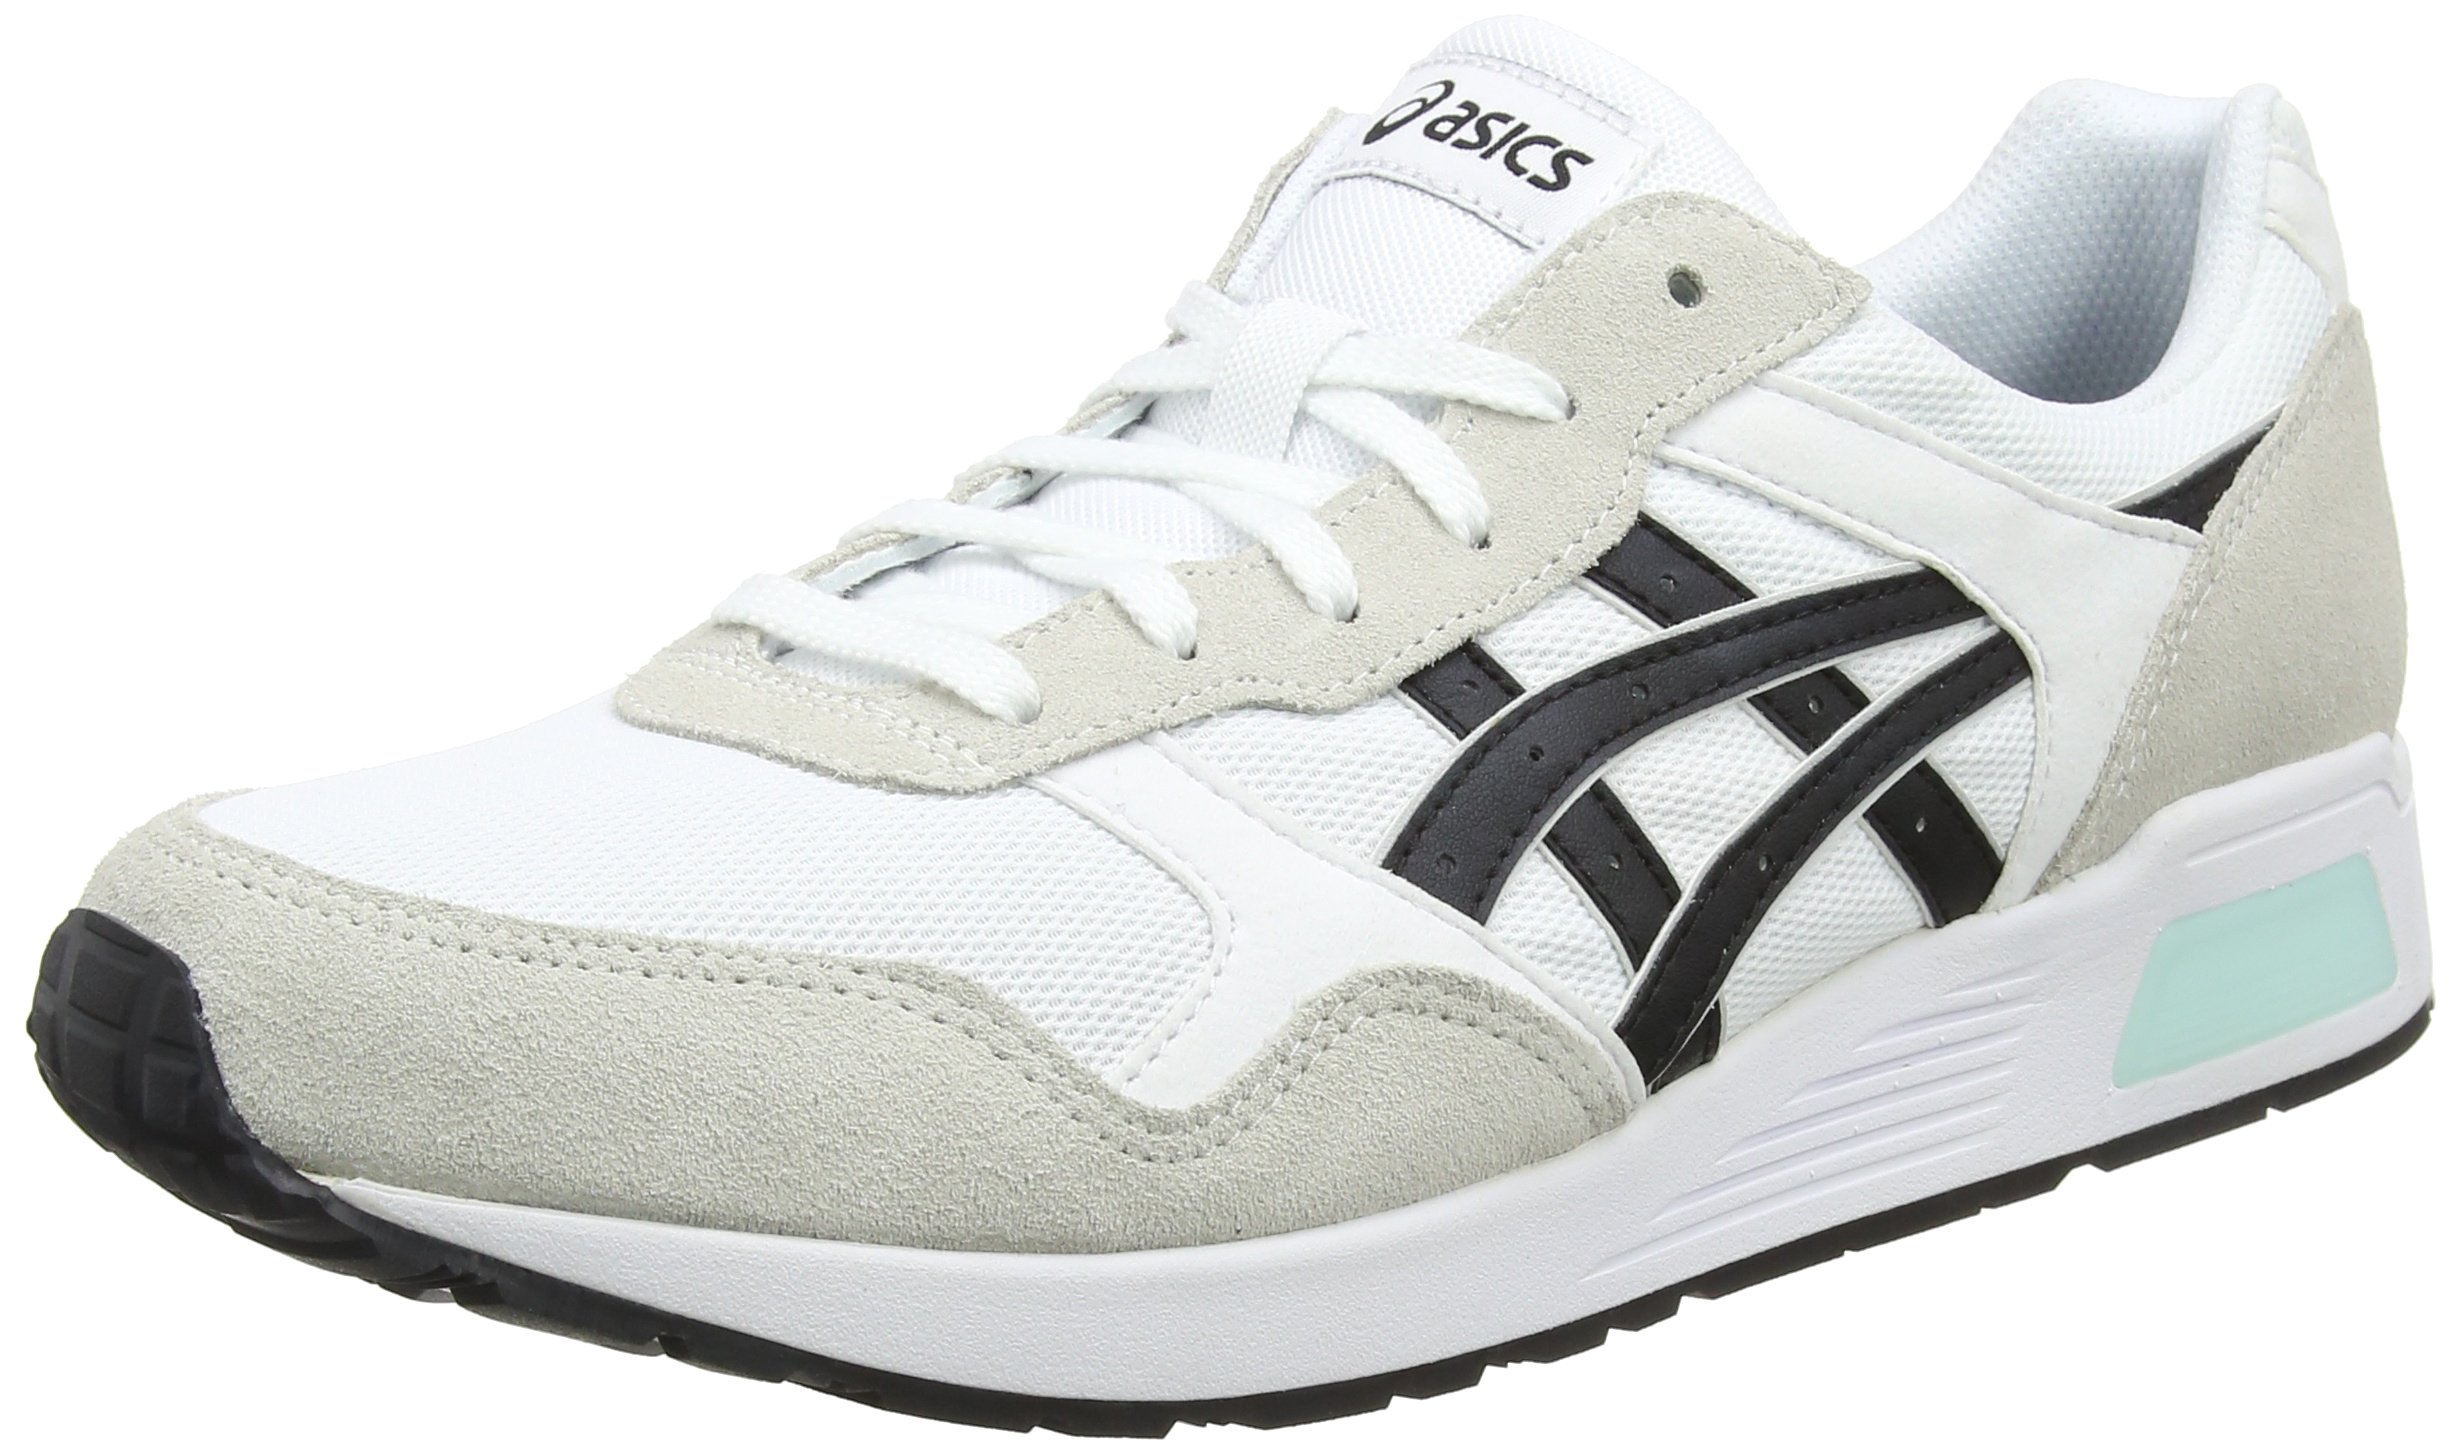 019044 Lyte Running De Eu HommeBlancwhite Asics trainerChaussures black W9HED2I